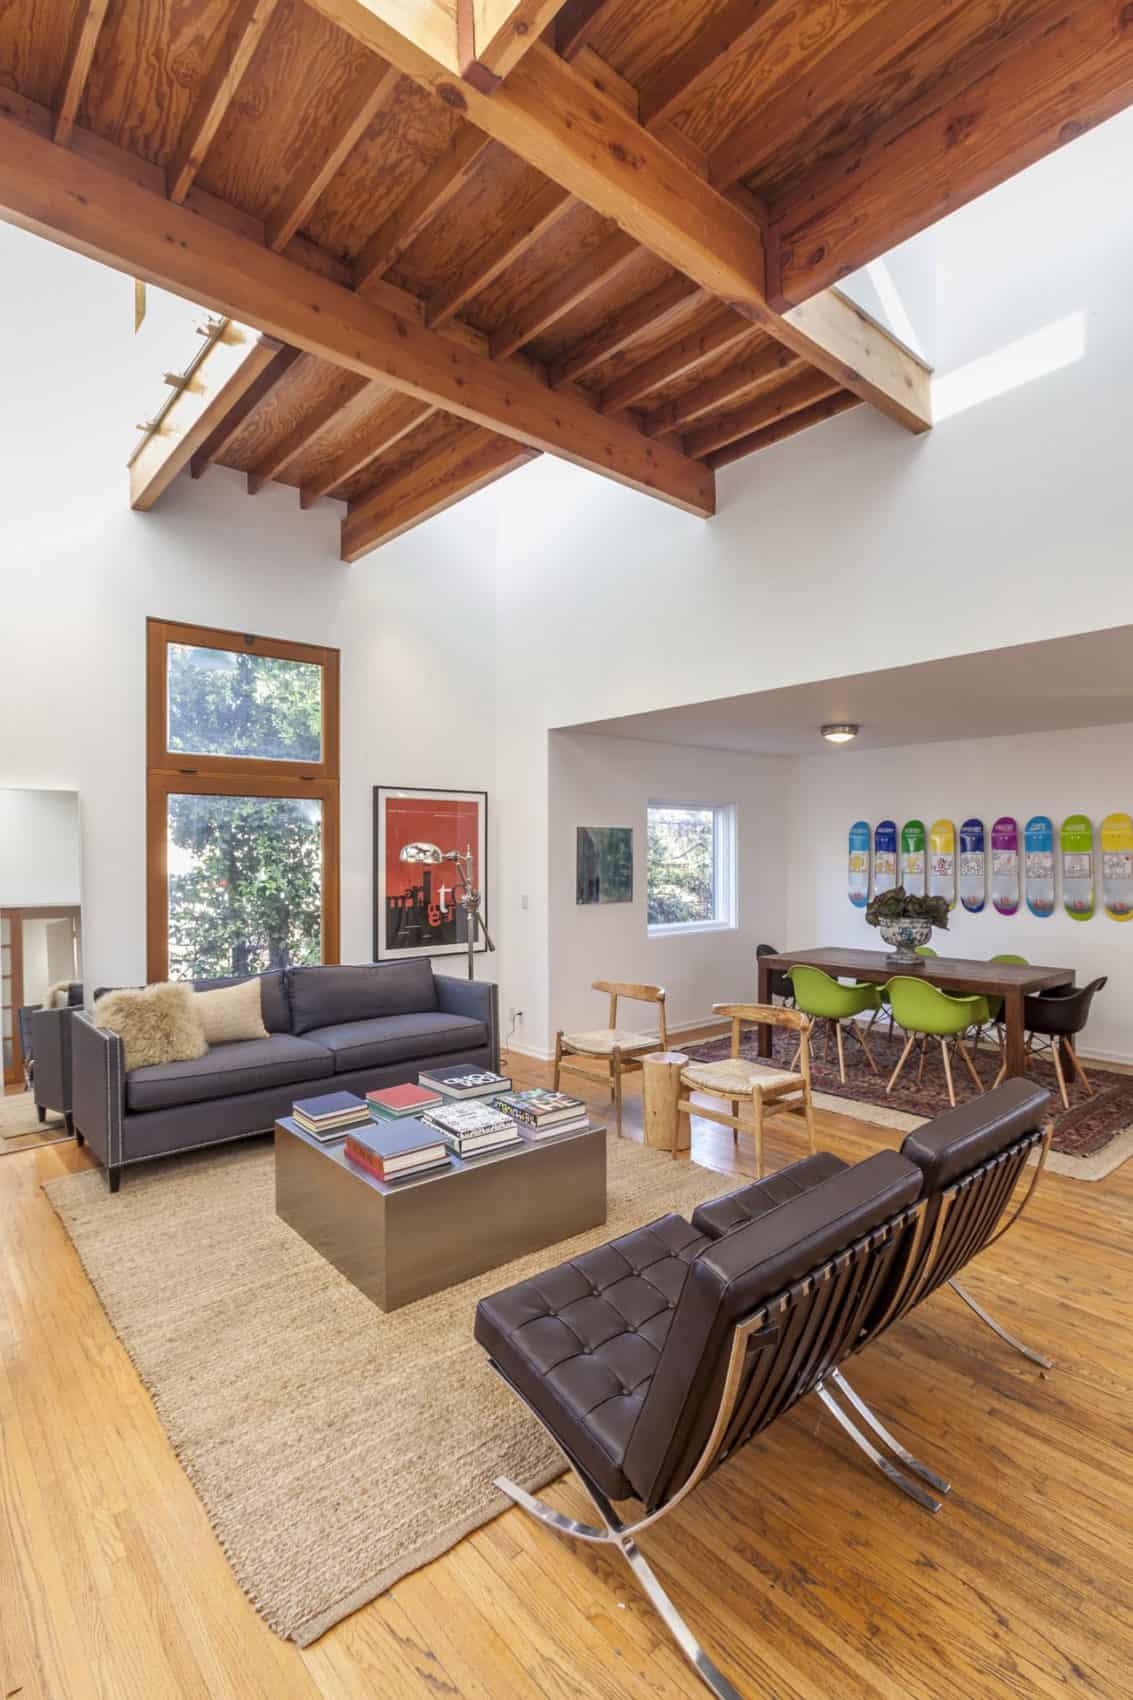 Princeton St. Bungalow by Ruben S. Ojeda Architects (4)